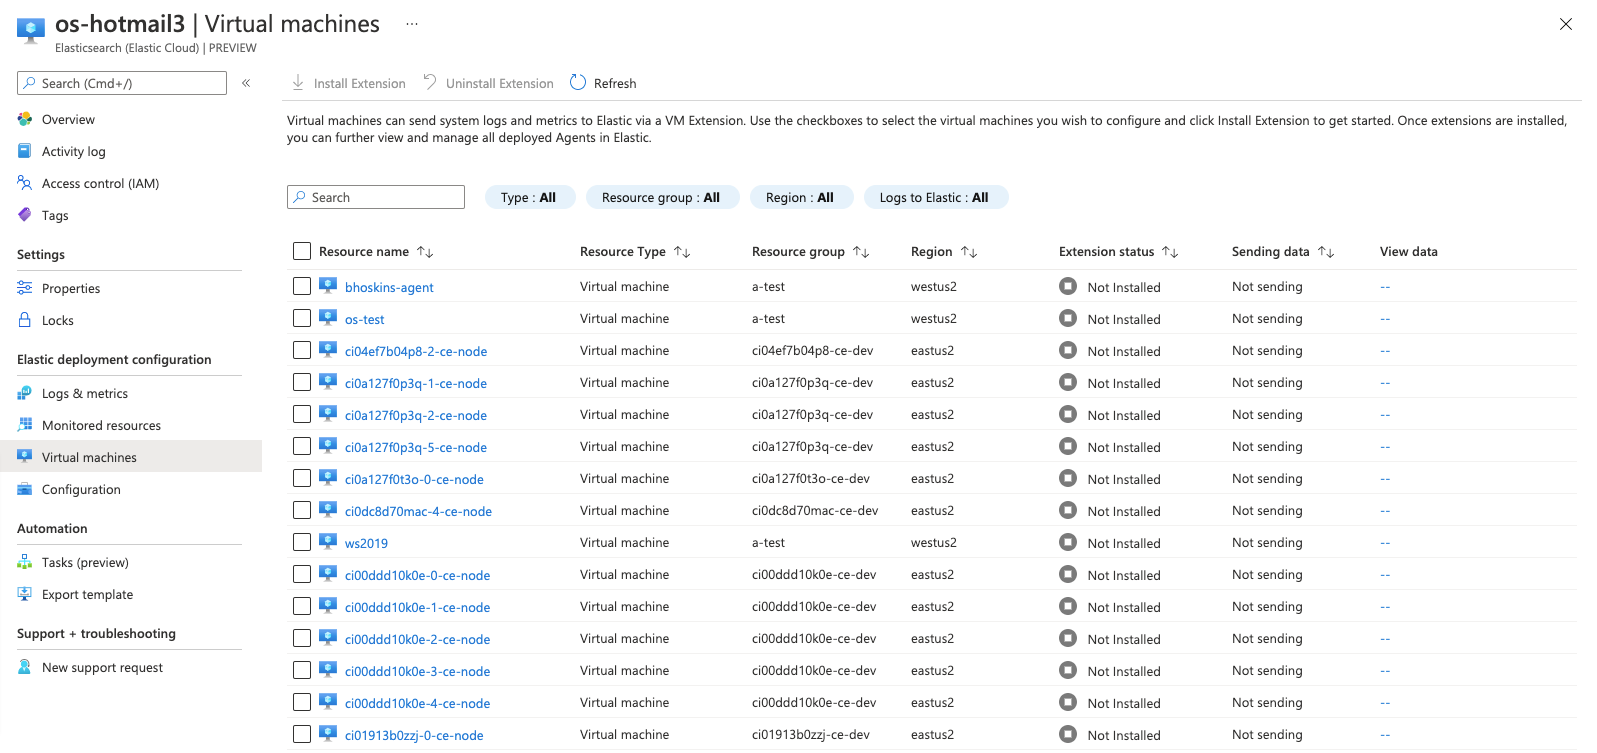 Screenshot of virtual machines overview